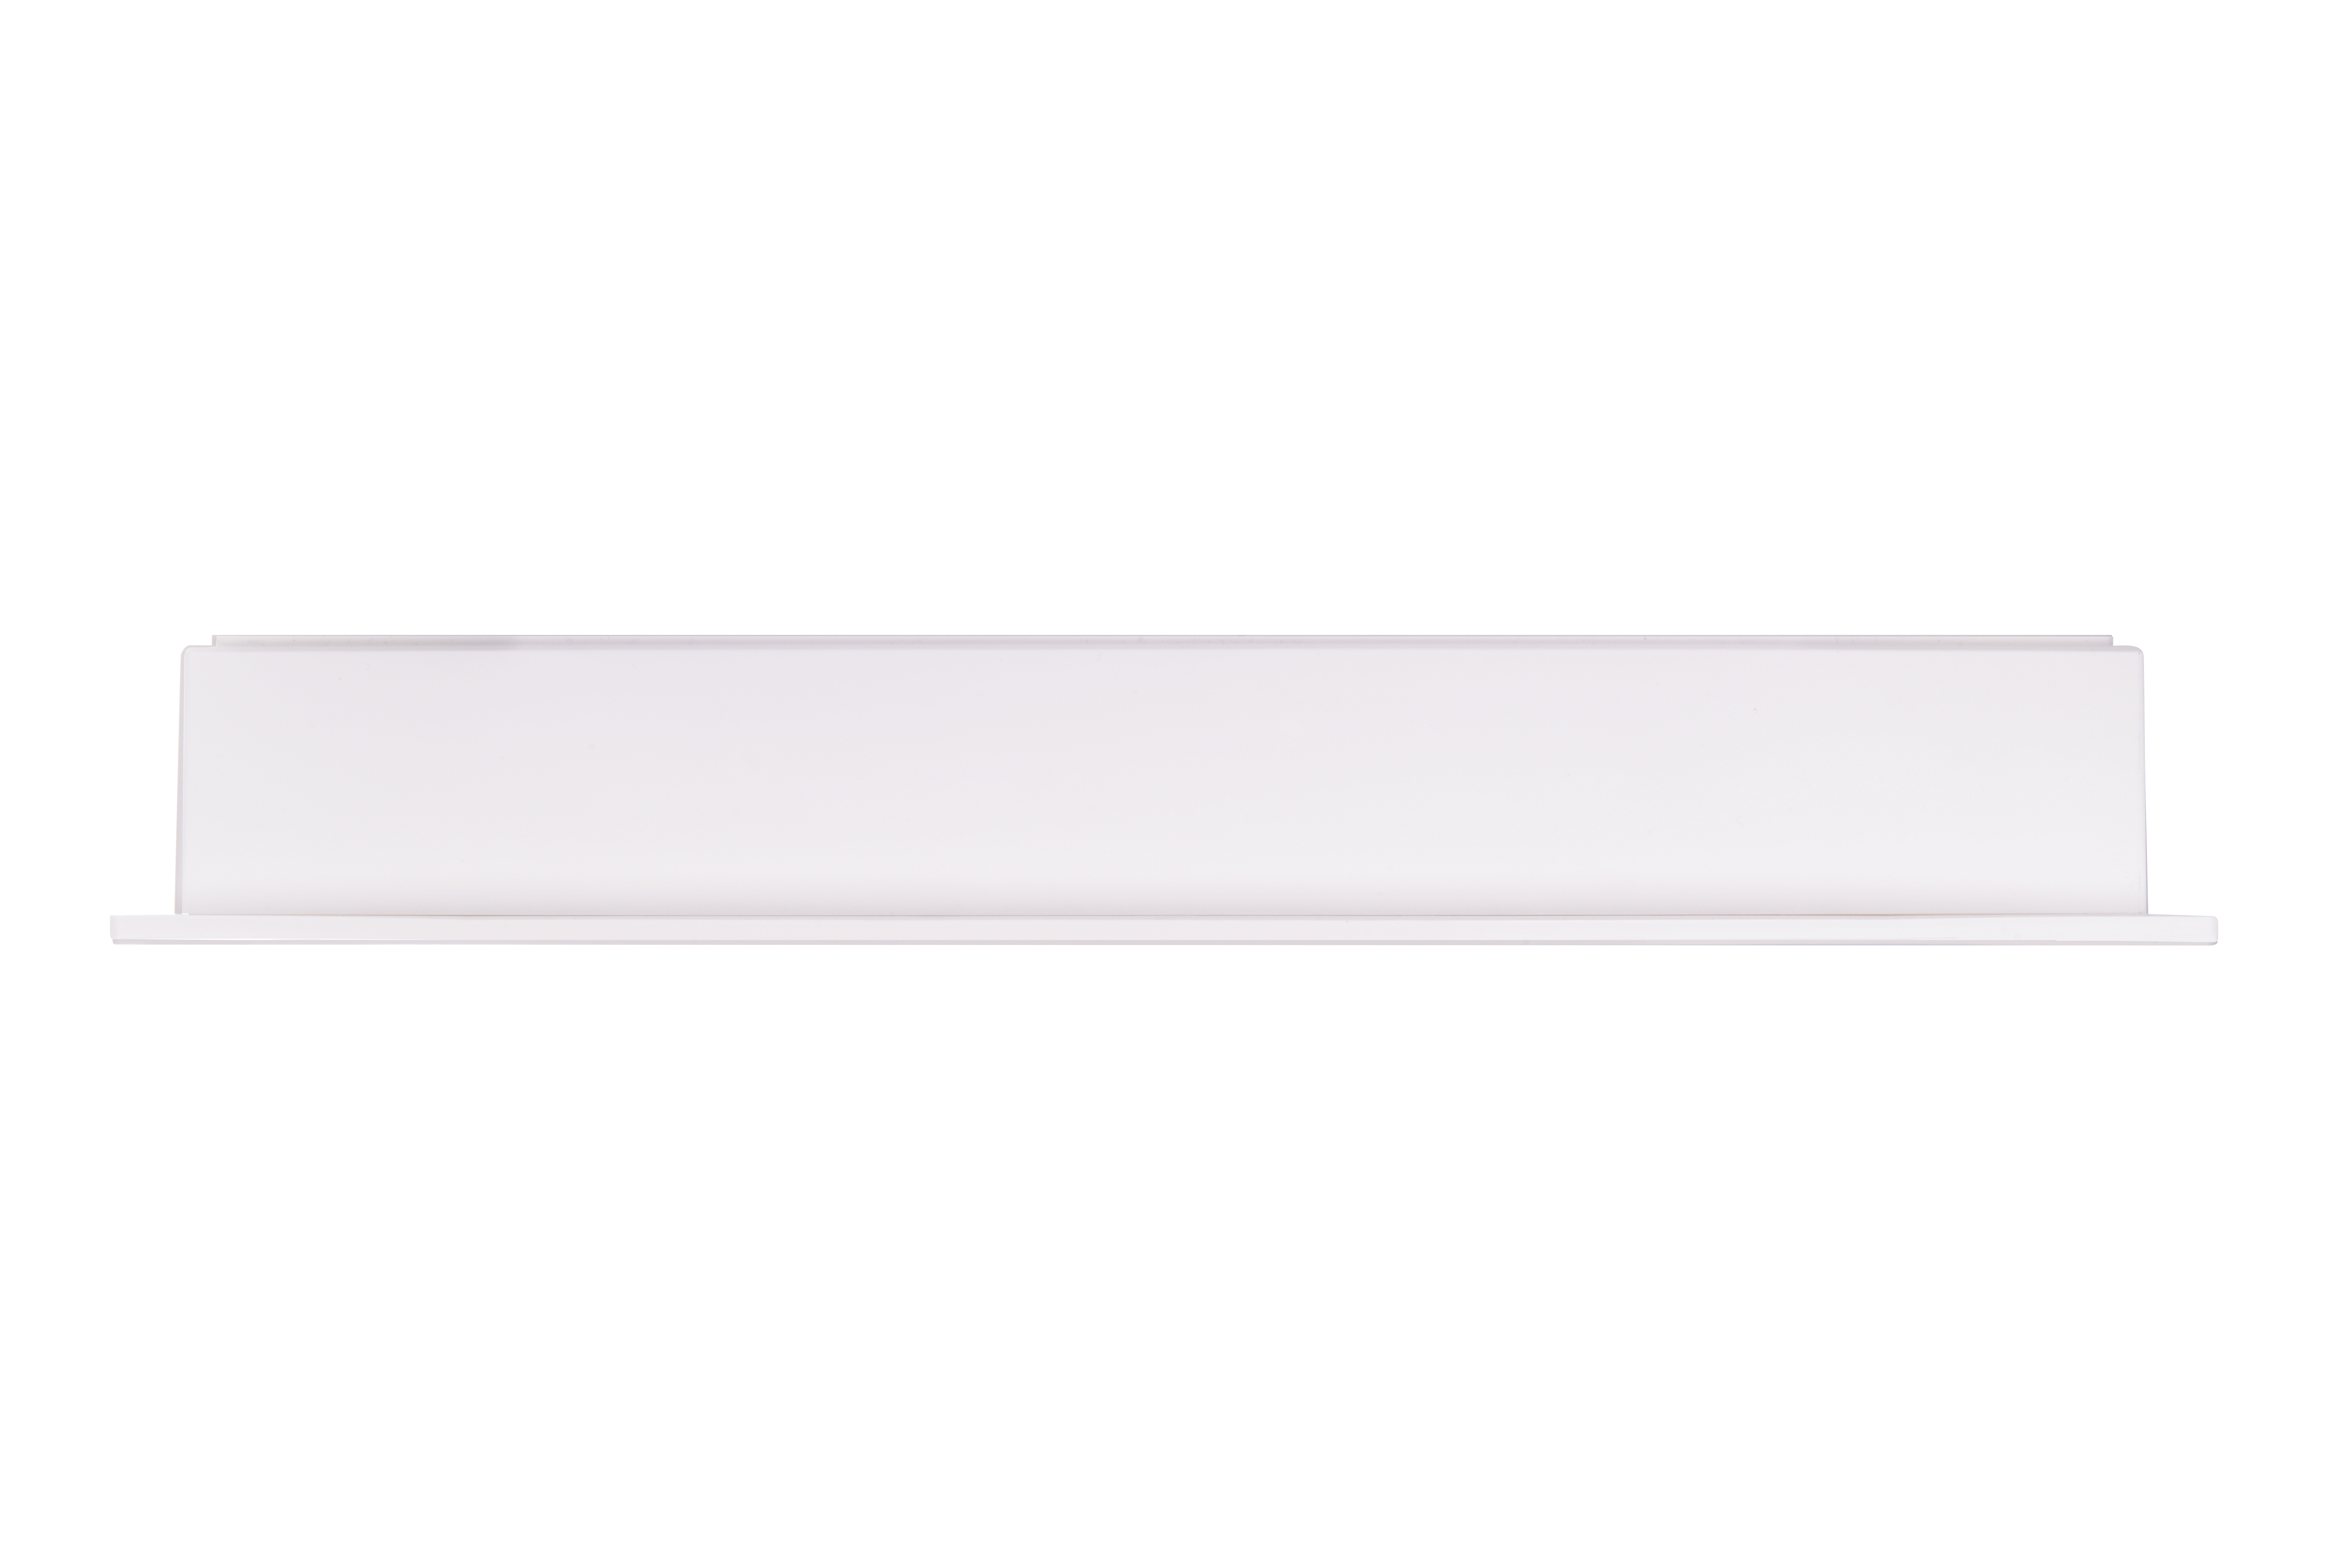 Lampa emergenta led Intelight 94717   3h nementinut test automat 5